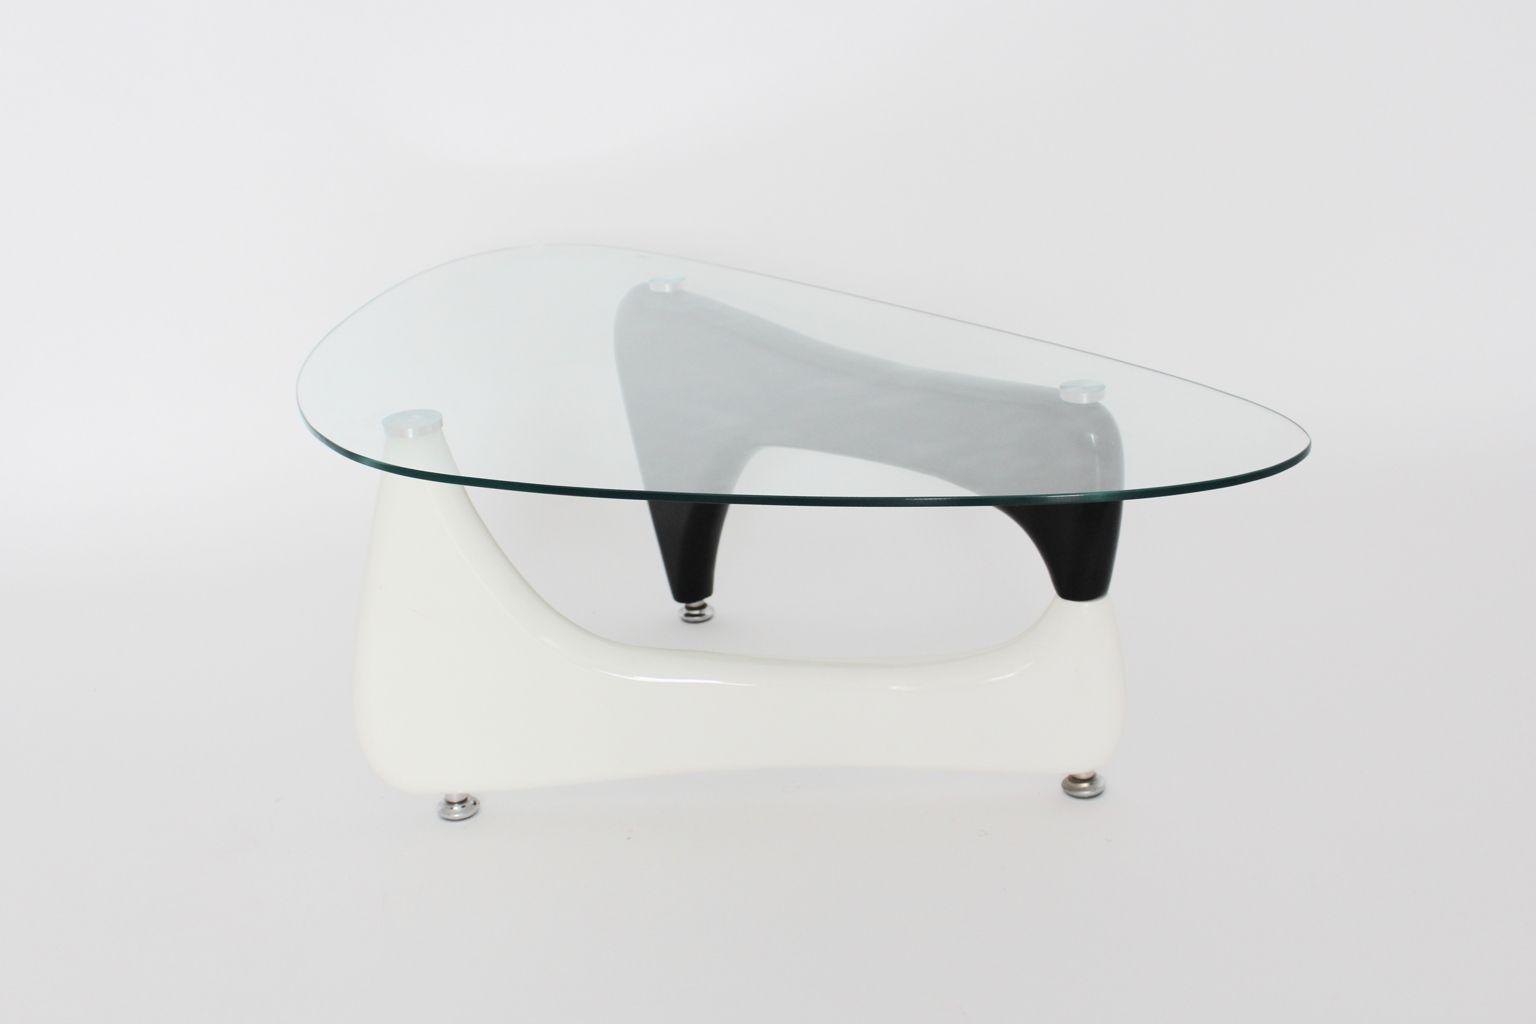 Mid Century Black And White Modern Coffee Table 1970s Bei Pamono Kaufen